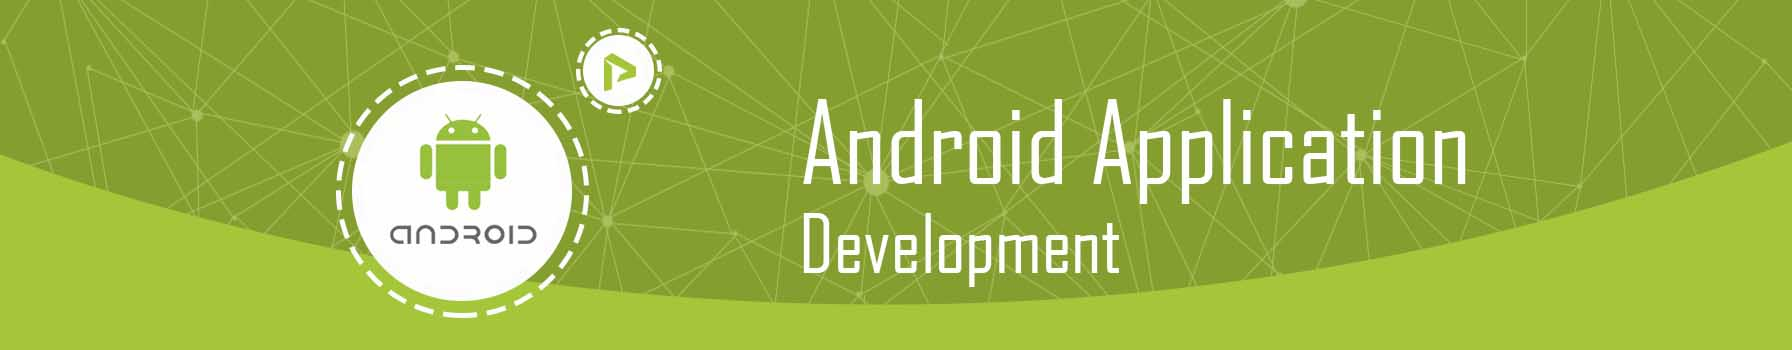 android-application-development.jpg